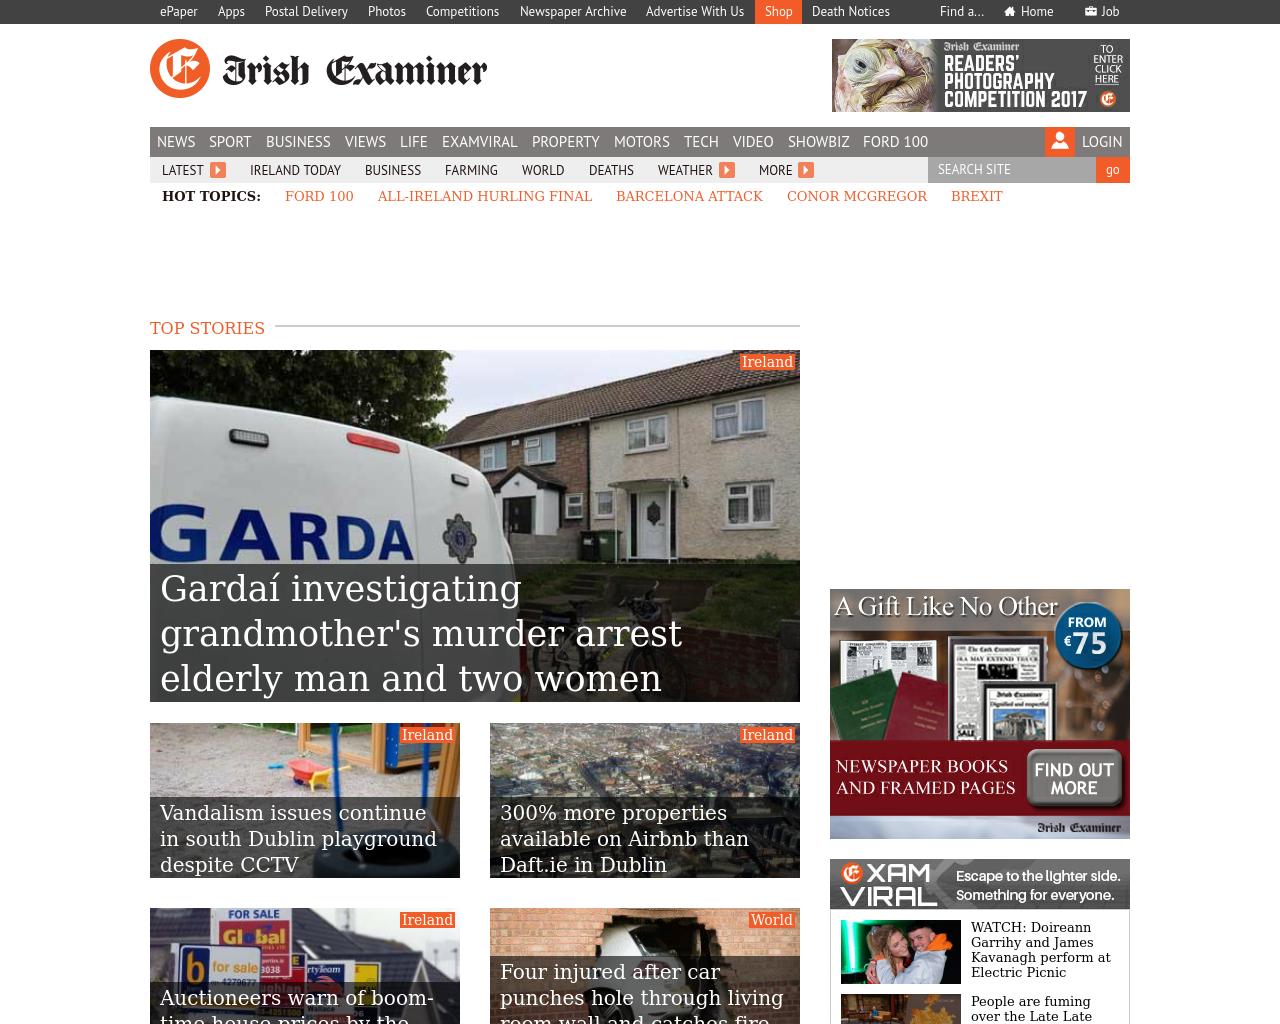 Irish-Examiner-Advertising-Reviews-Pricing